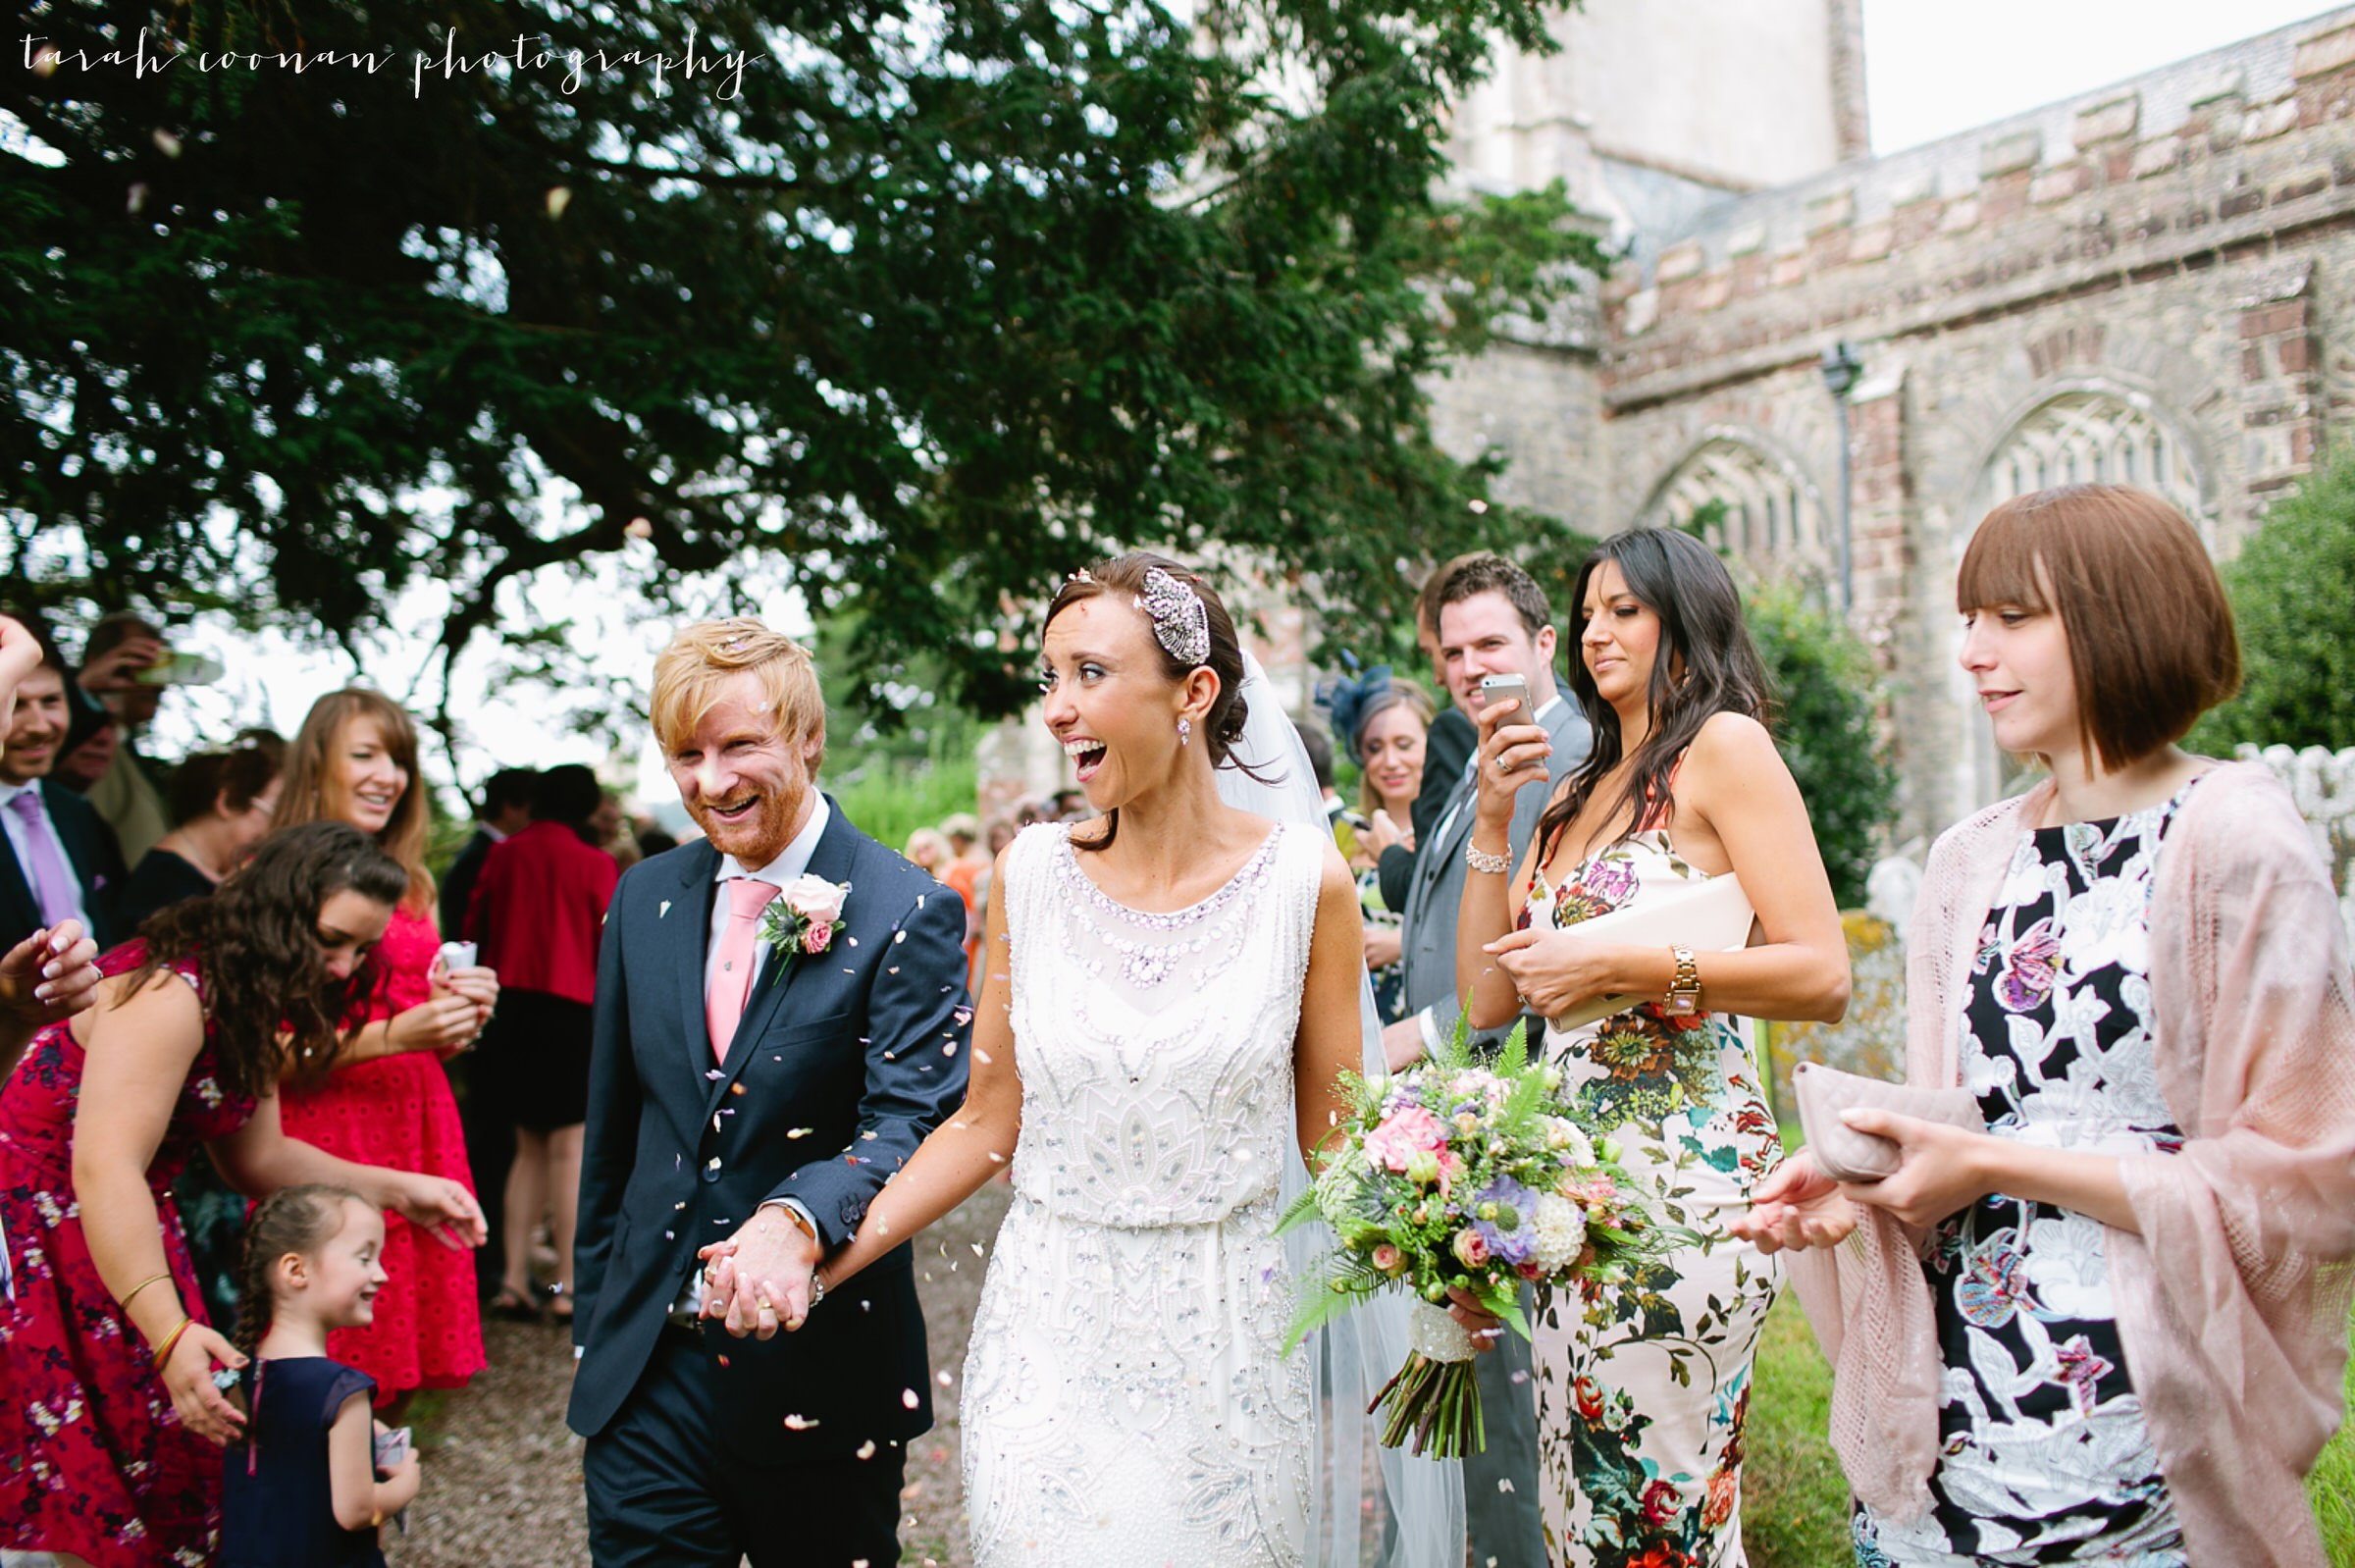 brighton-wedding-photographer35